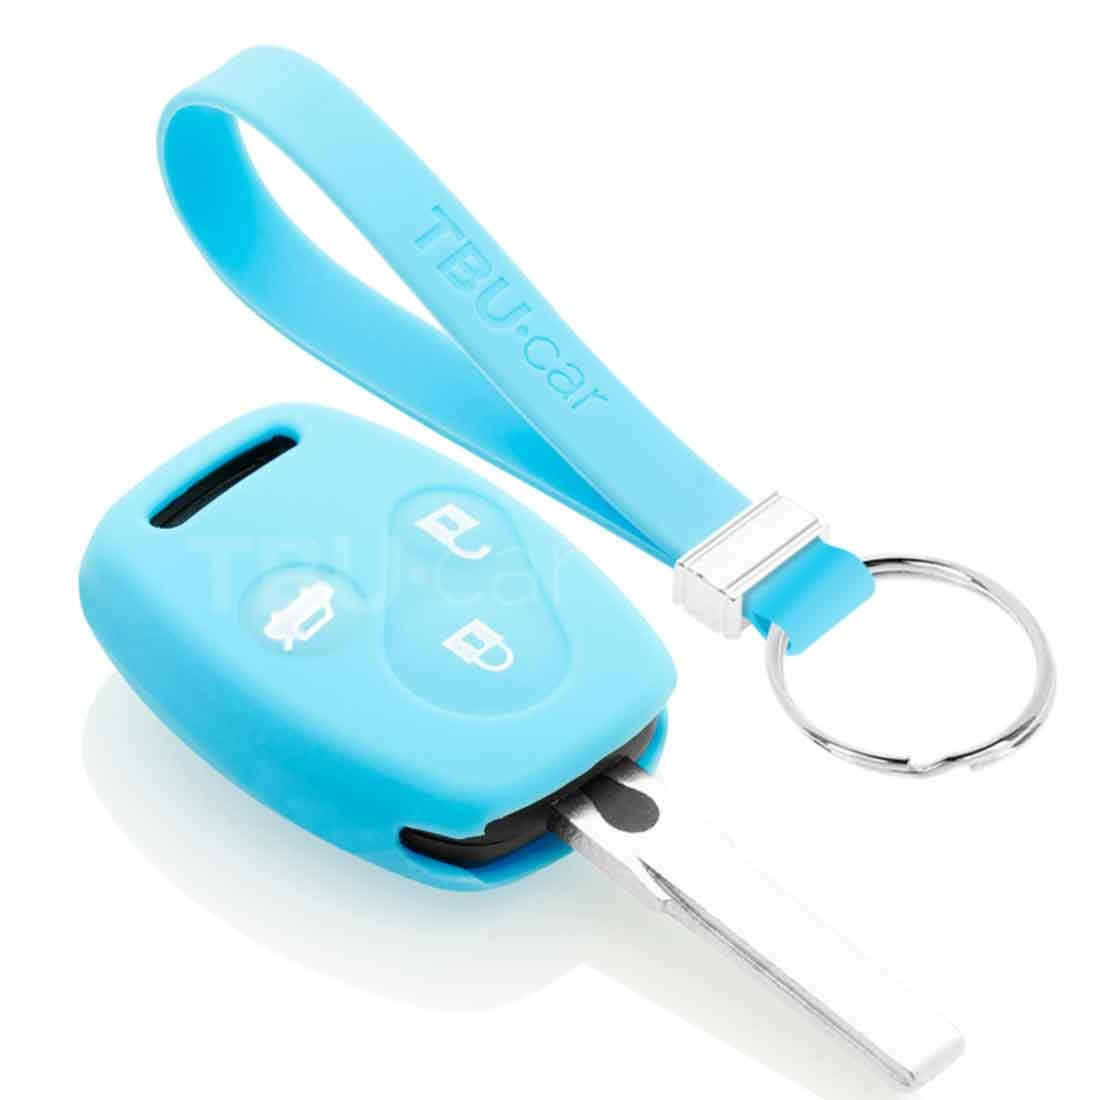 TBU car TBU car Autoschlüssel Hülle kompatibel mit Honda 3 Tasten - Schutzhülle aus Silikon - Auto Schlüsselhülle Cover in Hellblau